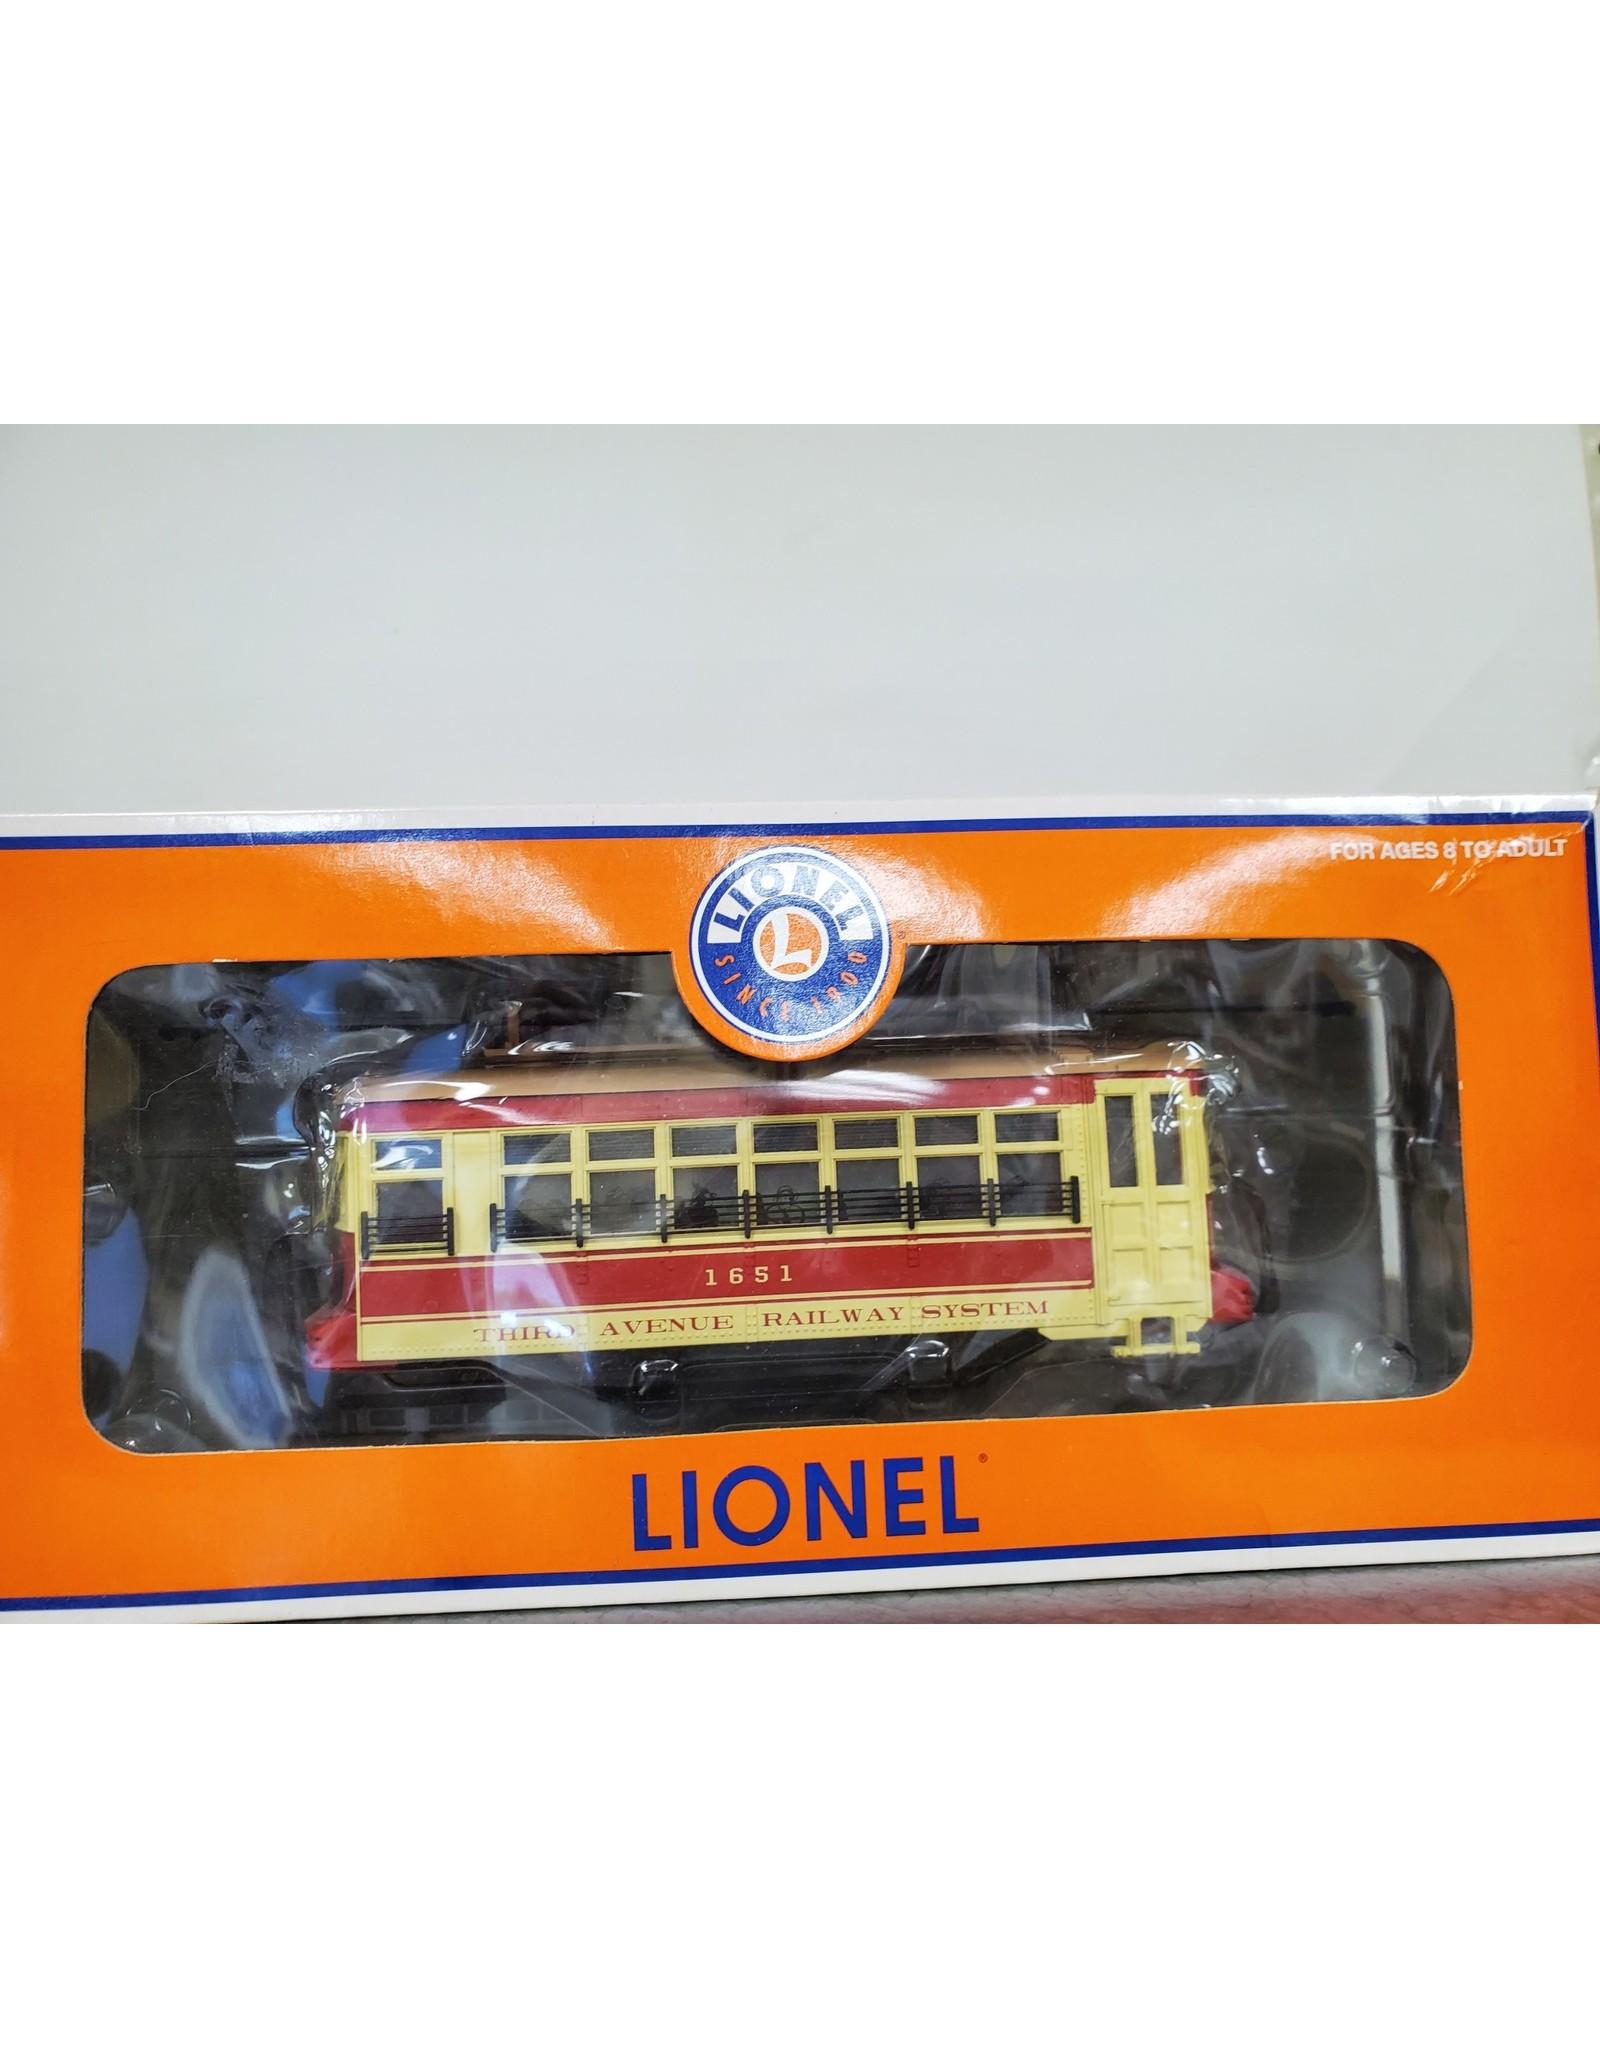 Lionel Trolley 3rd Avenue